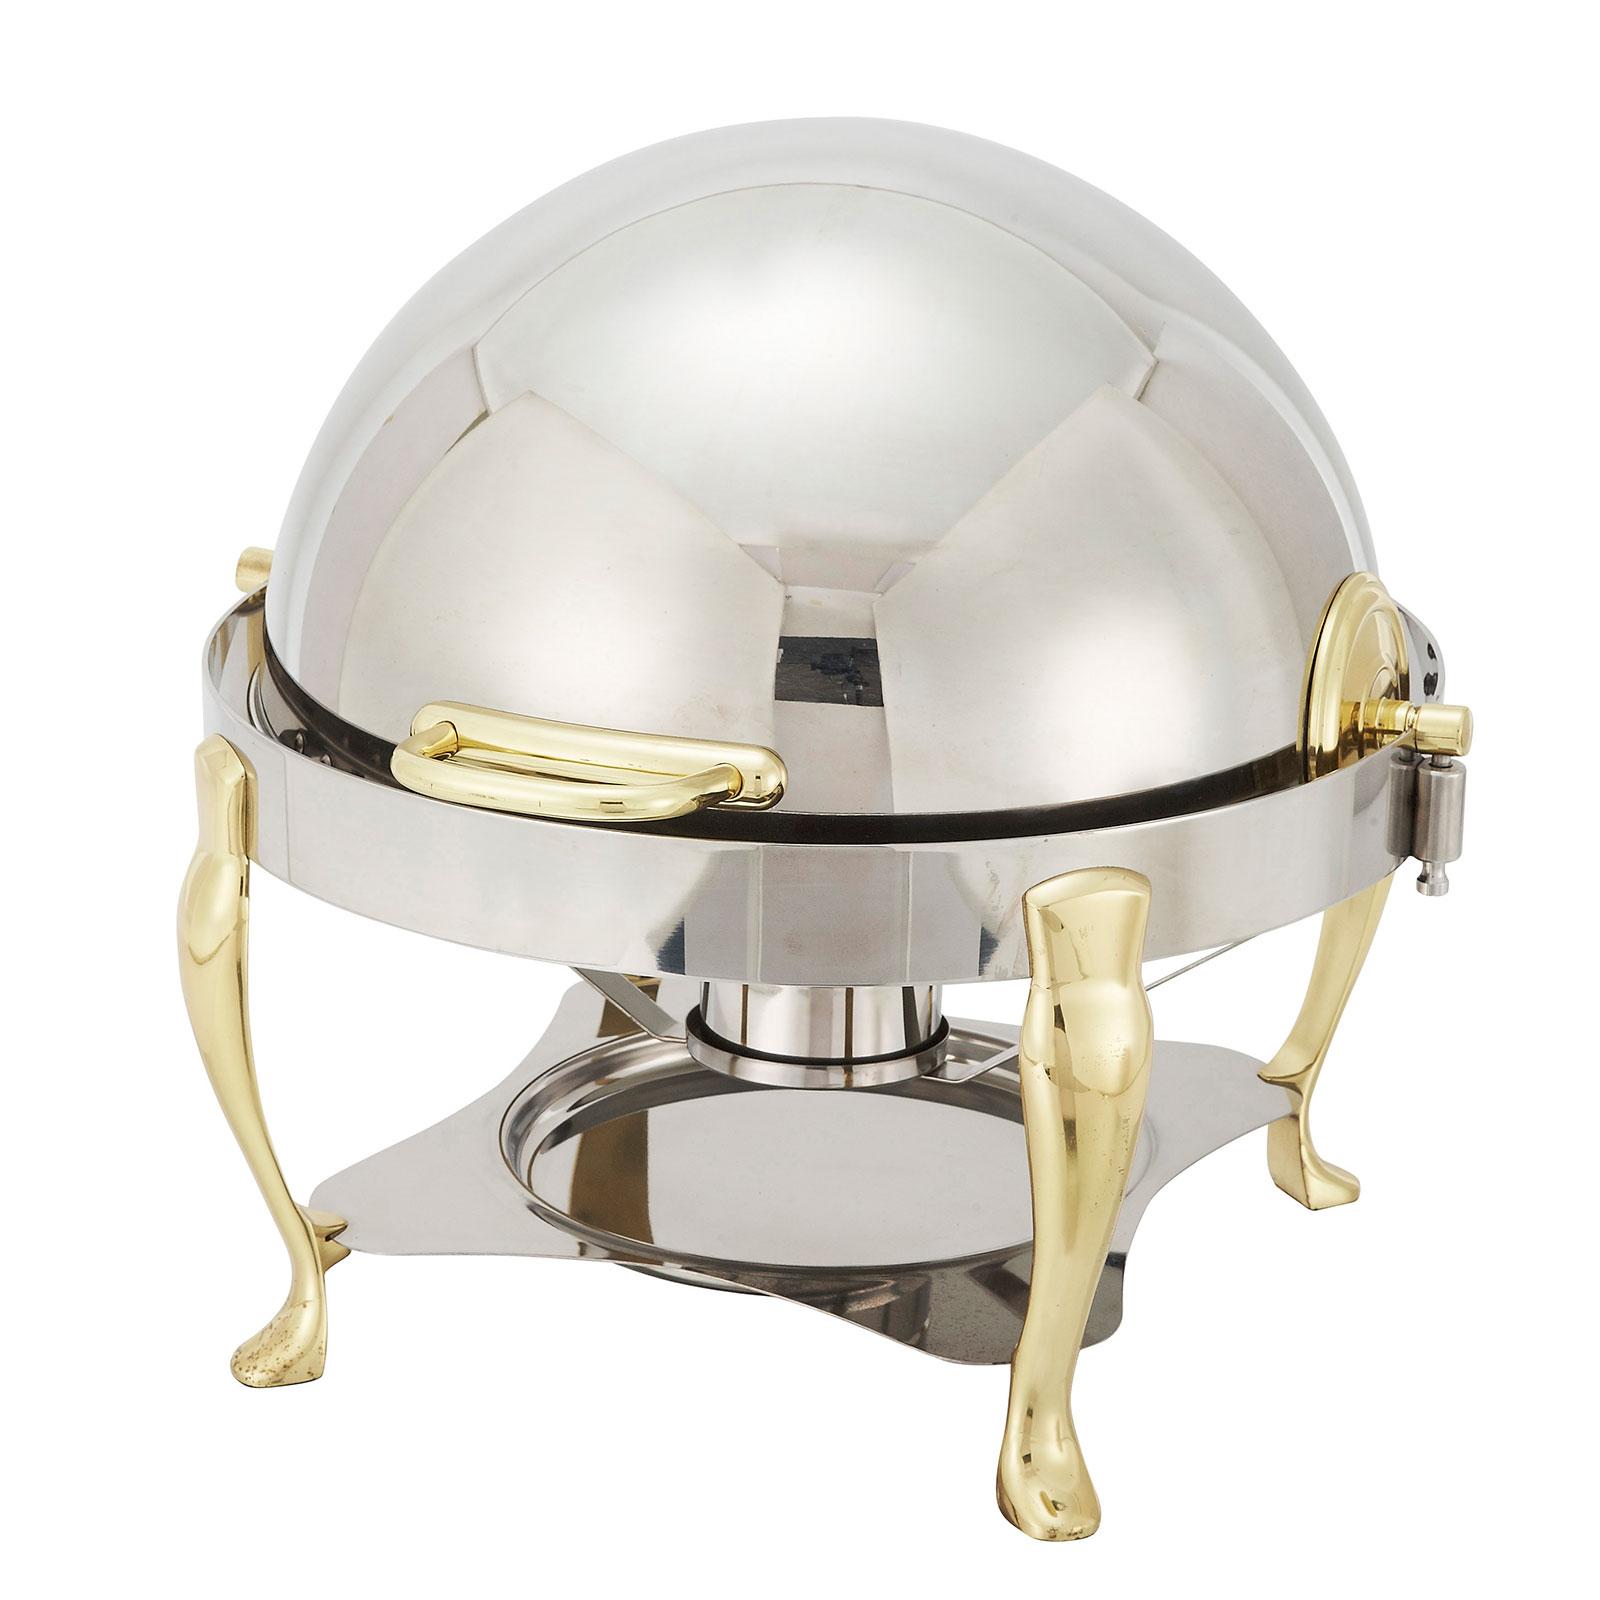 Winco 308A chafing dish